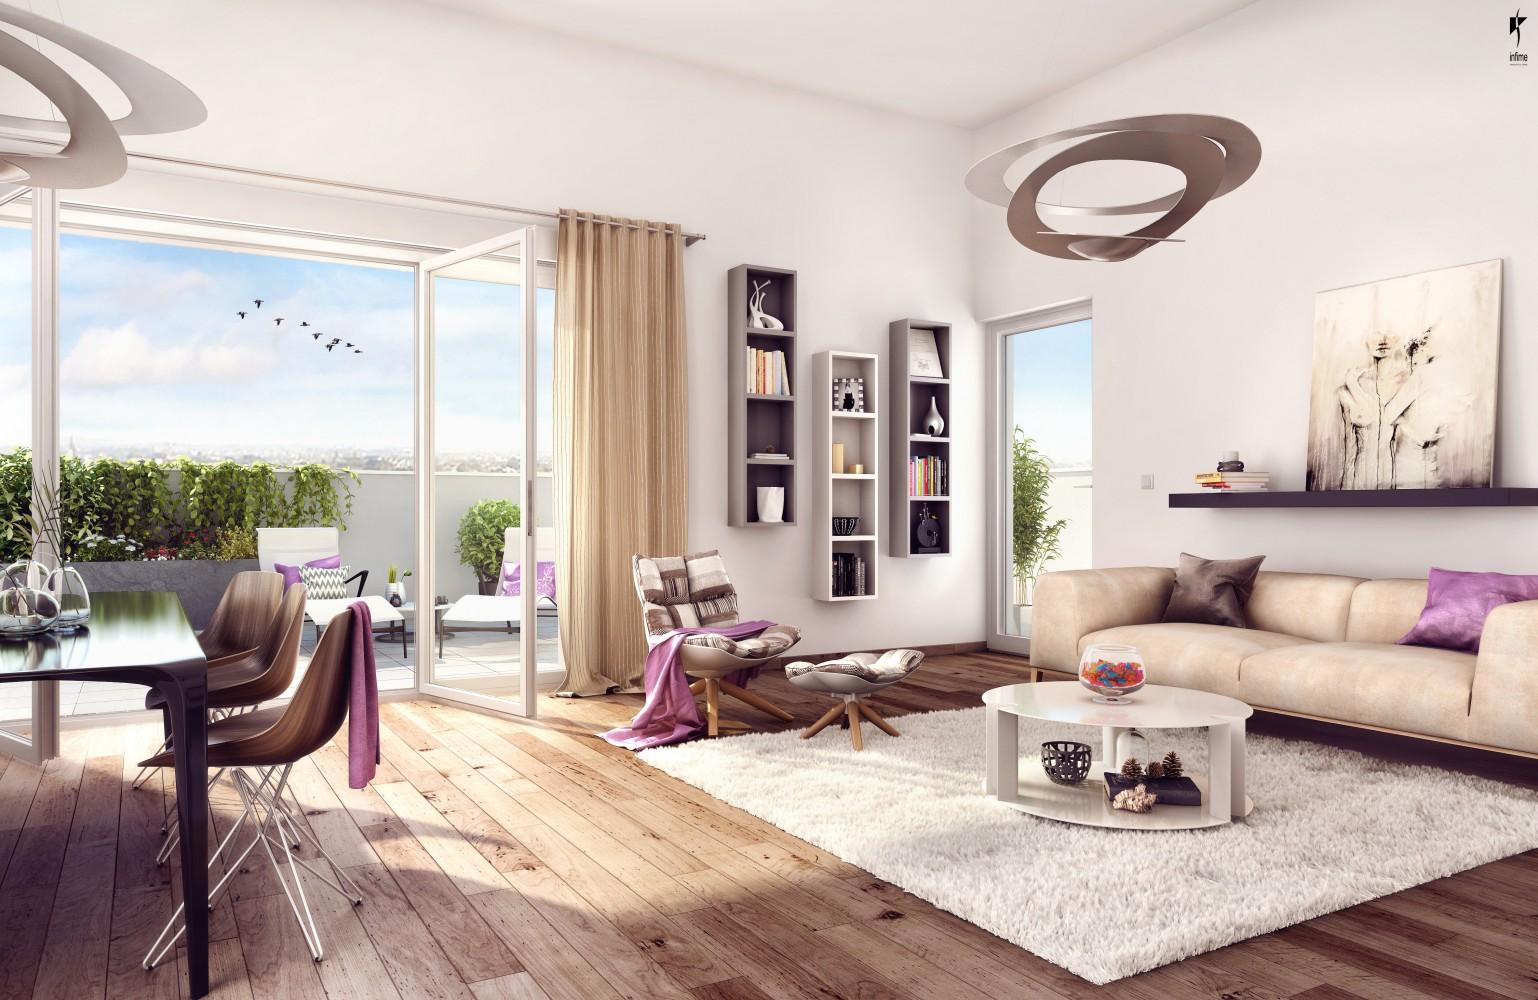 Immobilier neuf avantages et inconv nients blog home for Avantage acheter appartement neuf